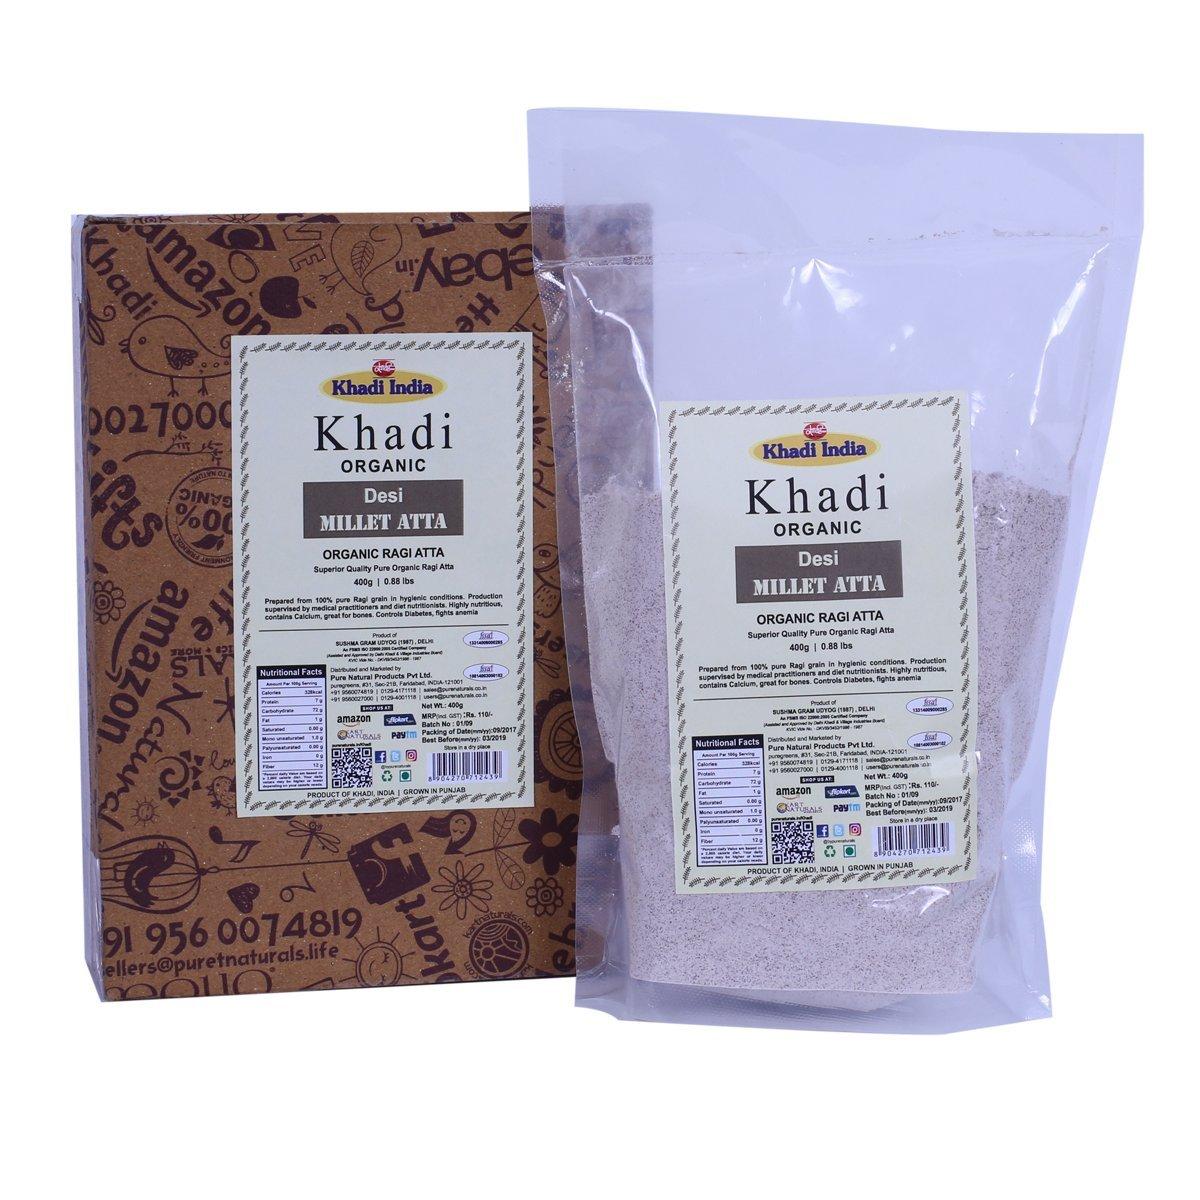 Khadi Organic Pure Ragi Atta (Finger Millet Flour) 400 GM - 100% Natural, Gluten-Free, Healthy Organic Food High-Fibre Flour, Controls Weight Gain, Excellent for Diabetics